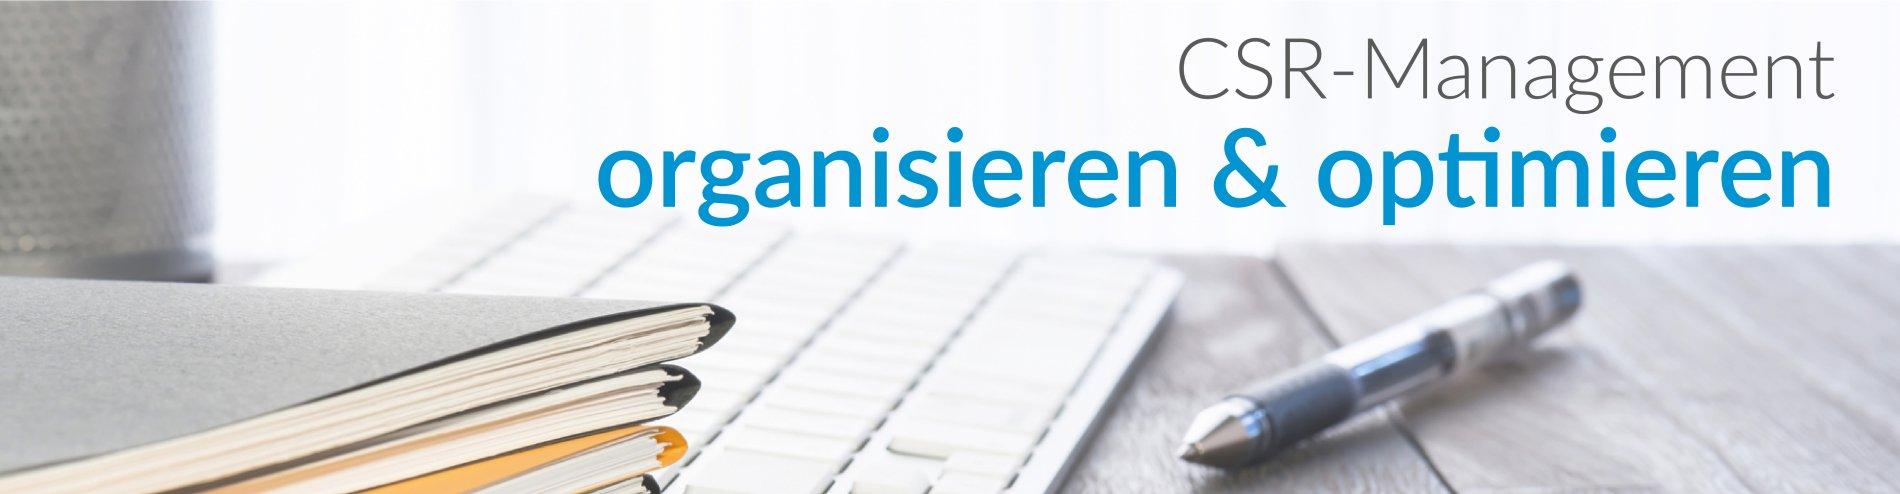 CSR-Management organisieren & optimieren